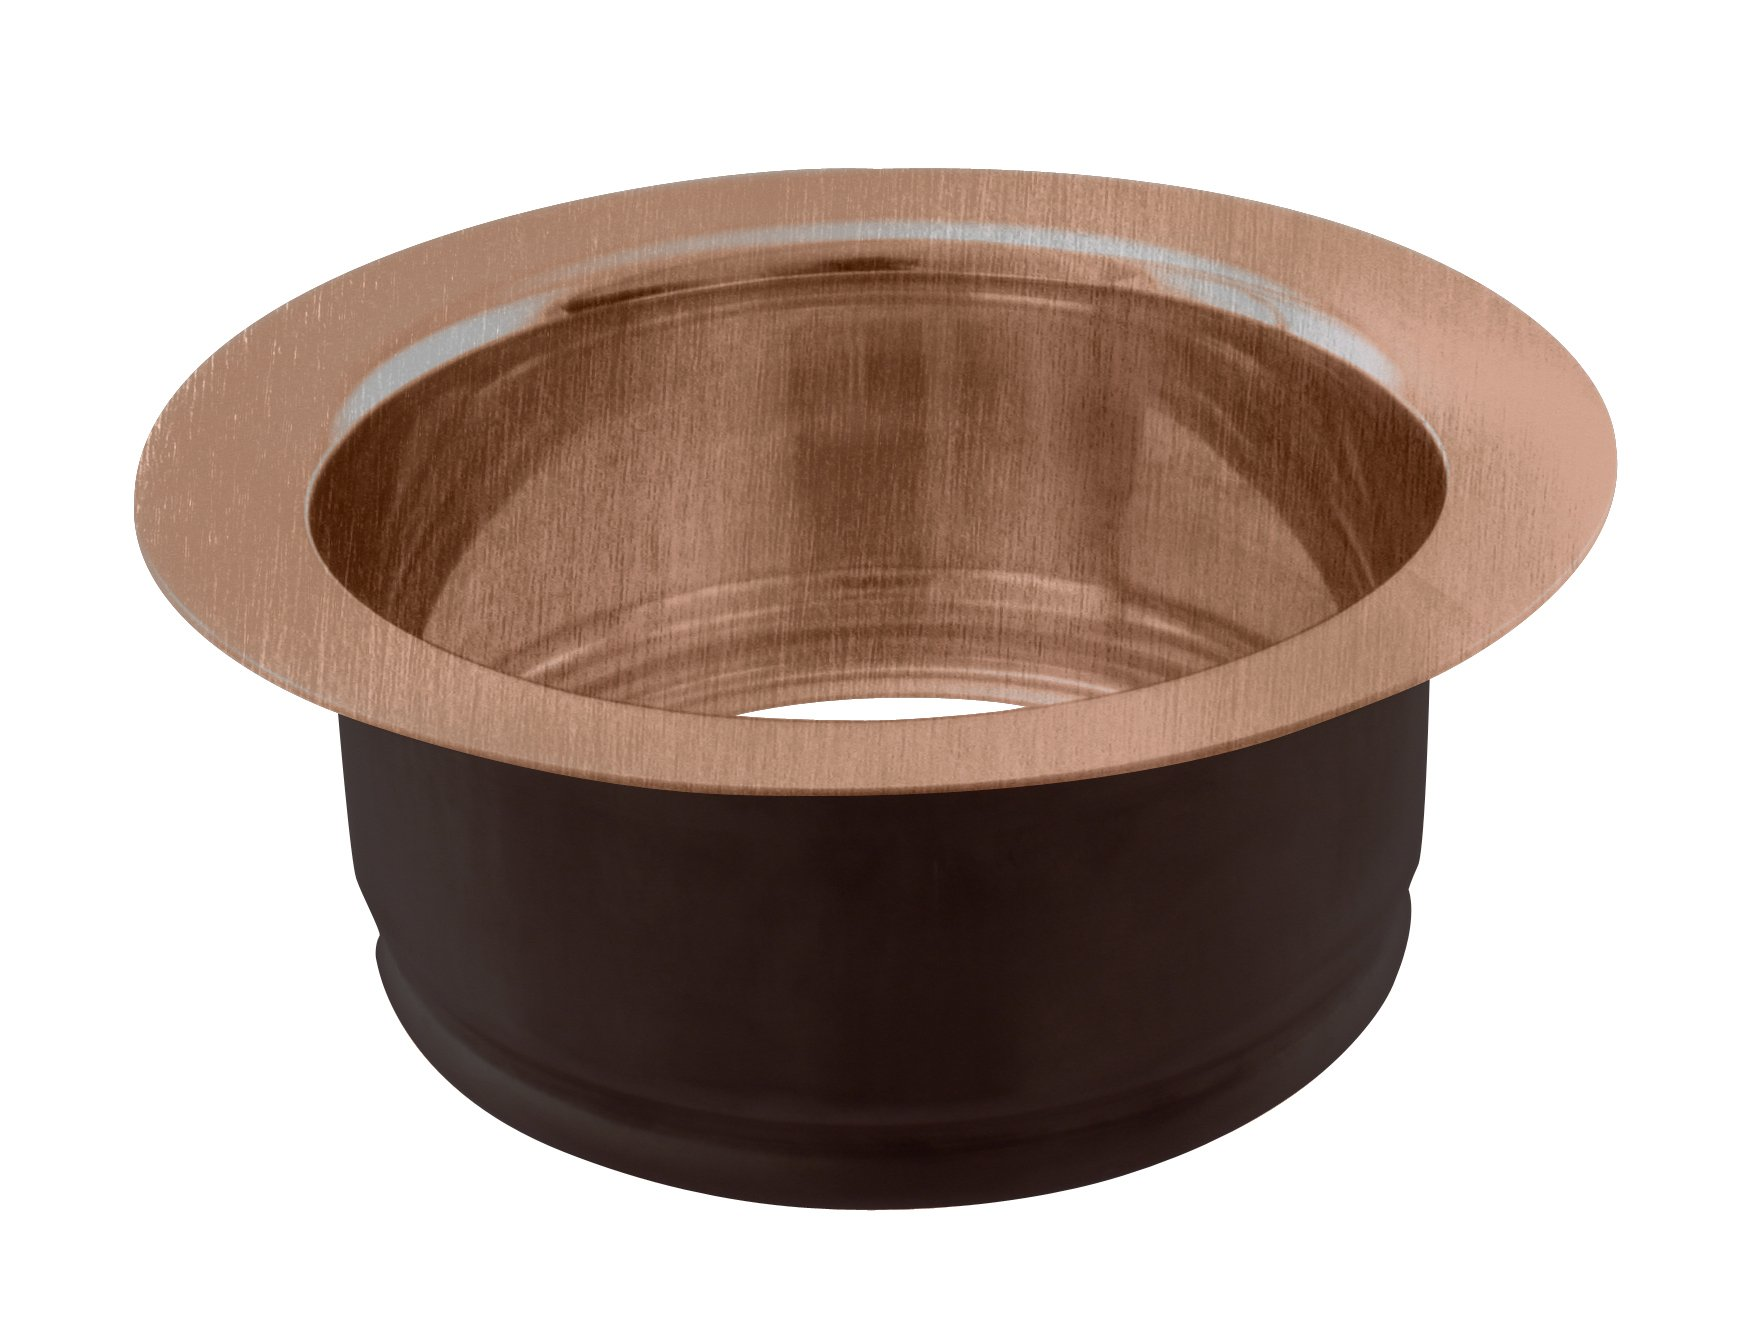 Westbrass InSinkErator Style Sink Disposal Flange, Antique Copper, D208-11